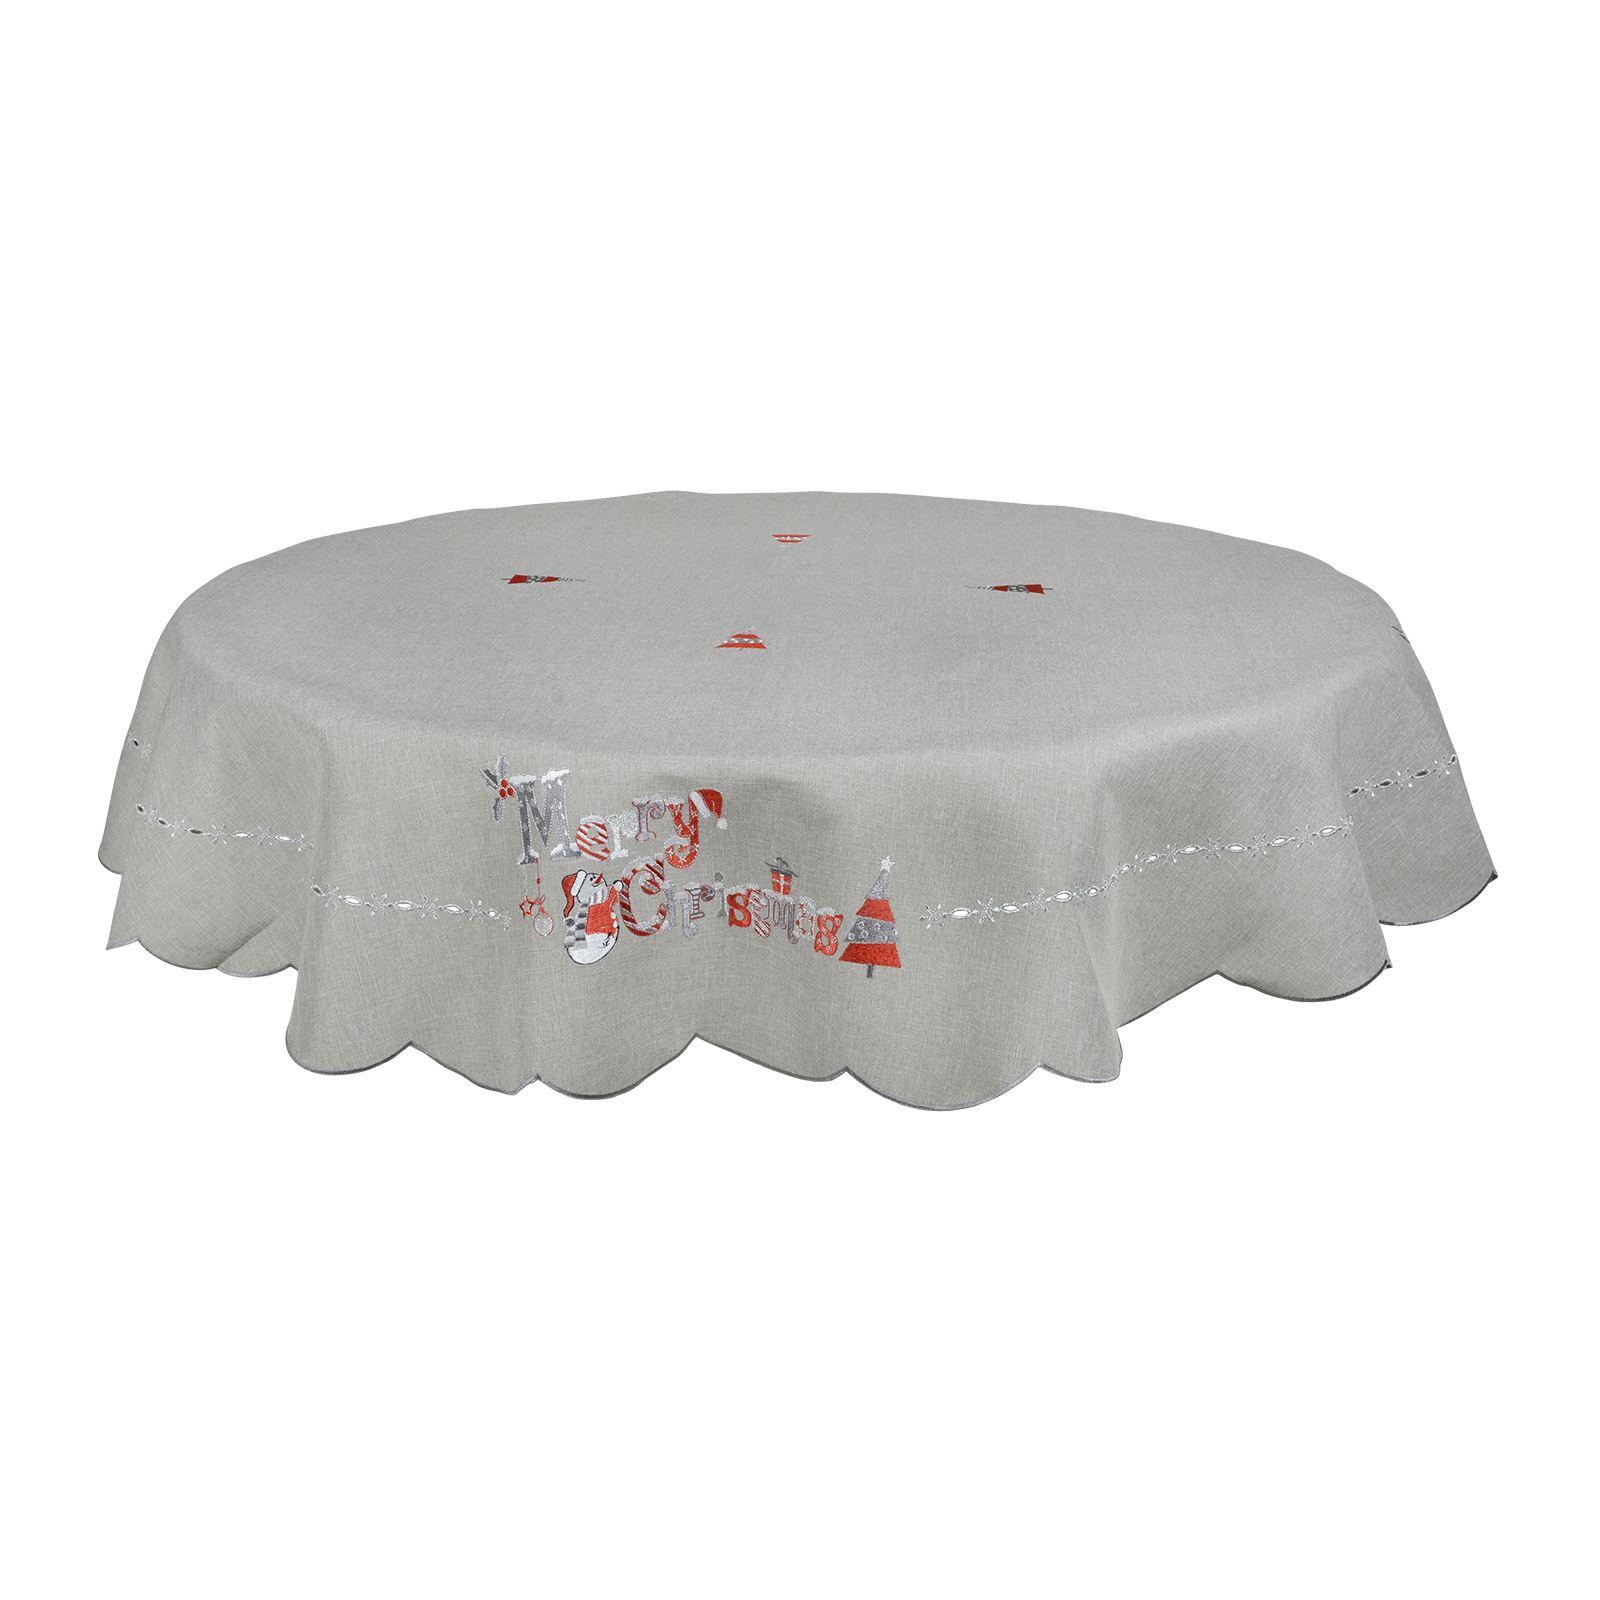 Christmas-Tablecloth-Festive-Pattern-Rectangle-Round-Fabric-Xmas-Room-Decoration Indexbild 119